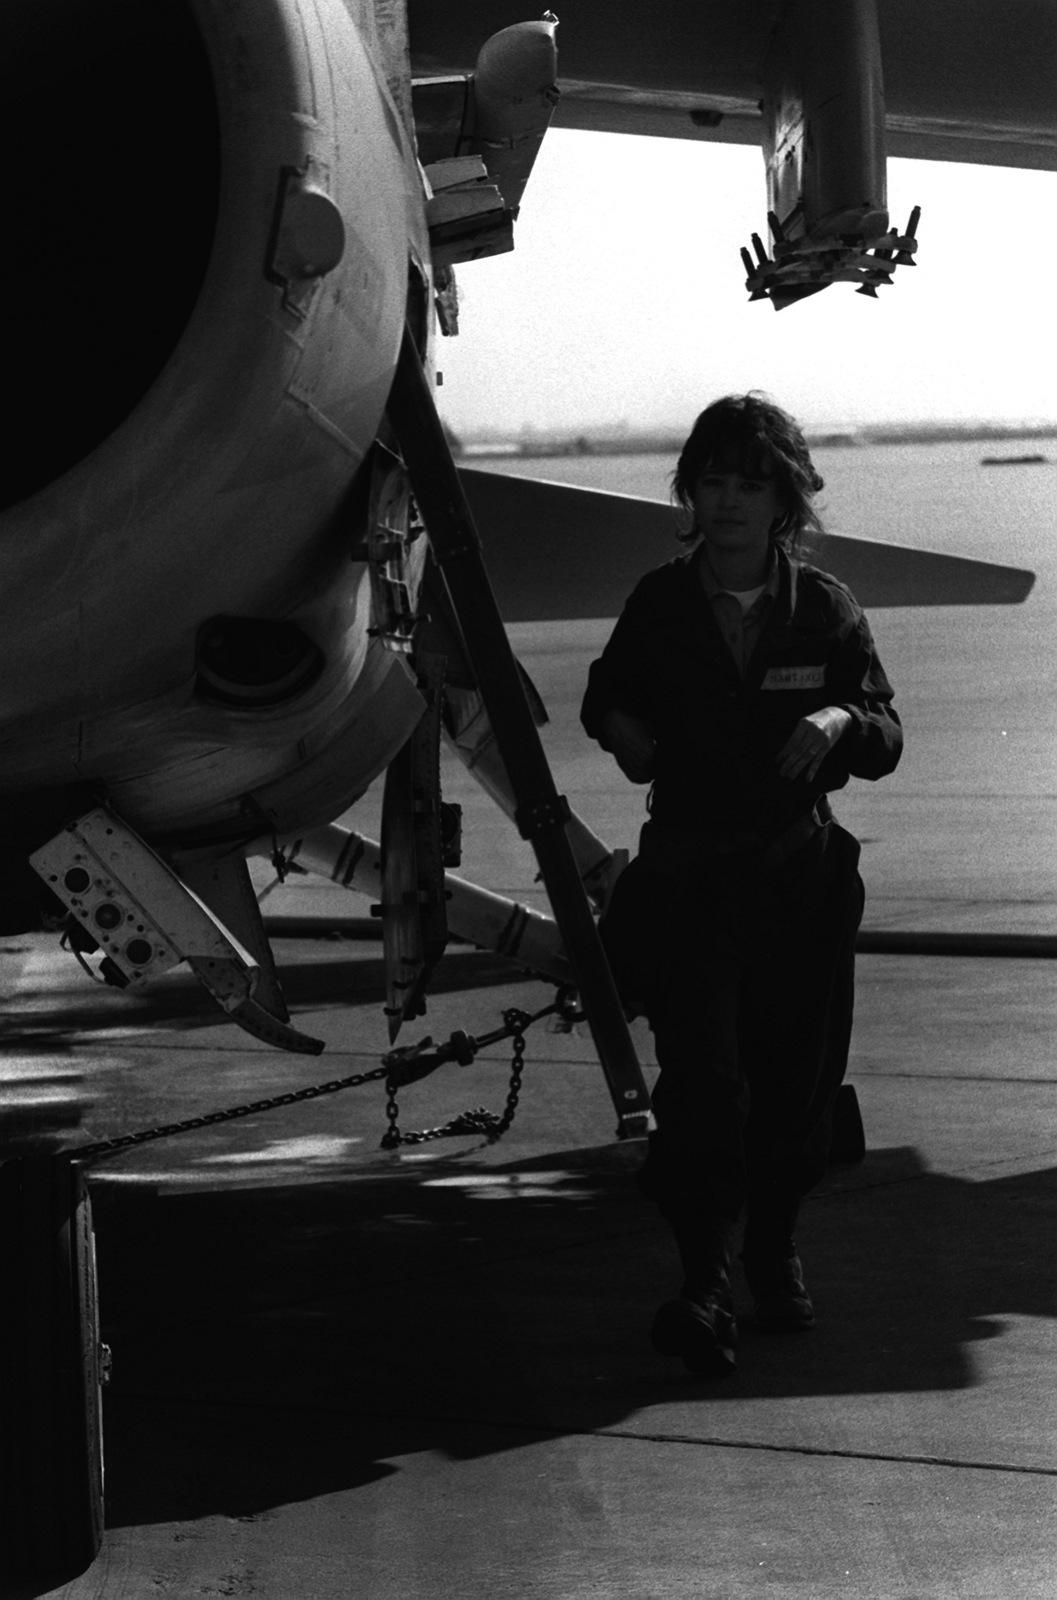 AIRMAN Grisselle Martinez performs a routine maintenance inspection on an A-7 Corsair II aircraft